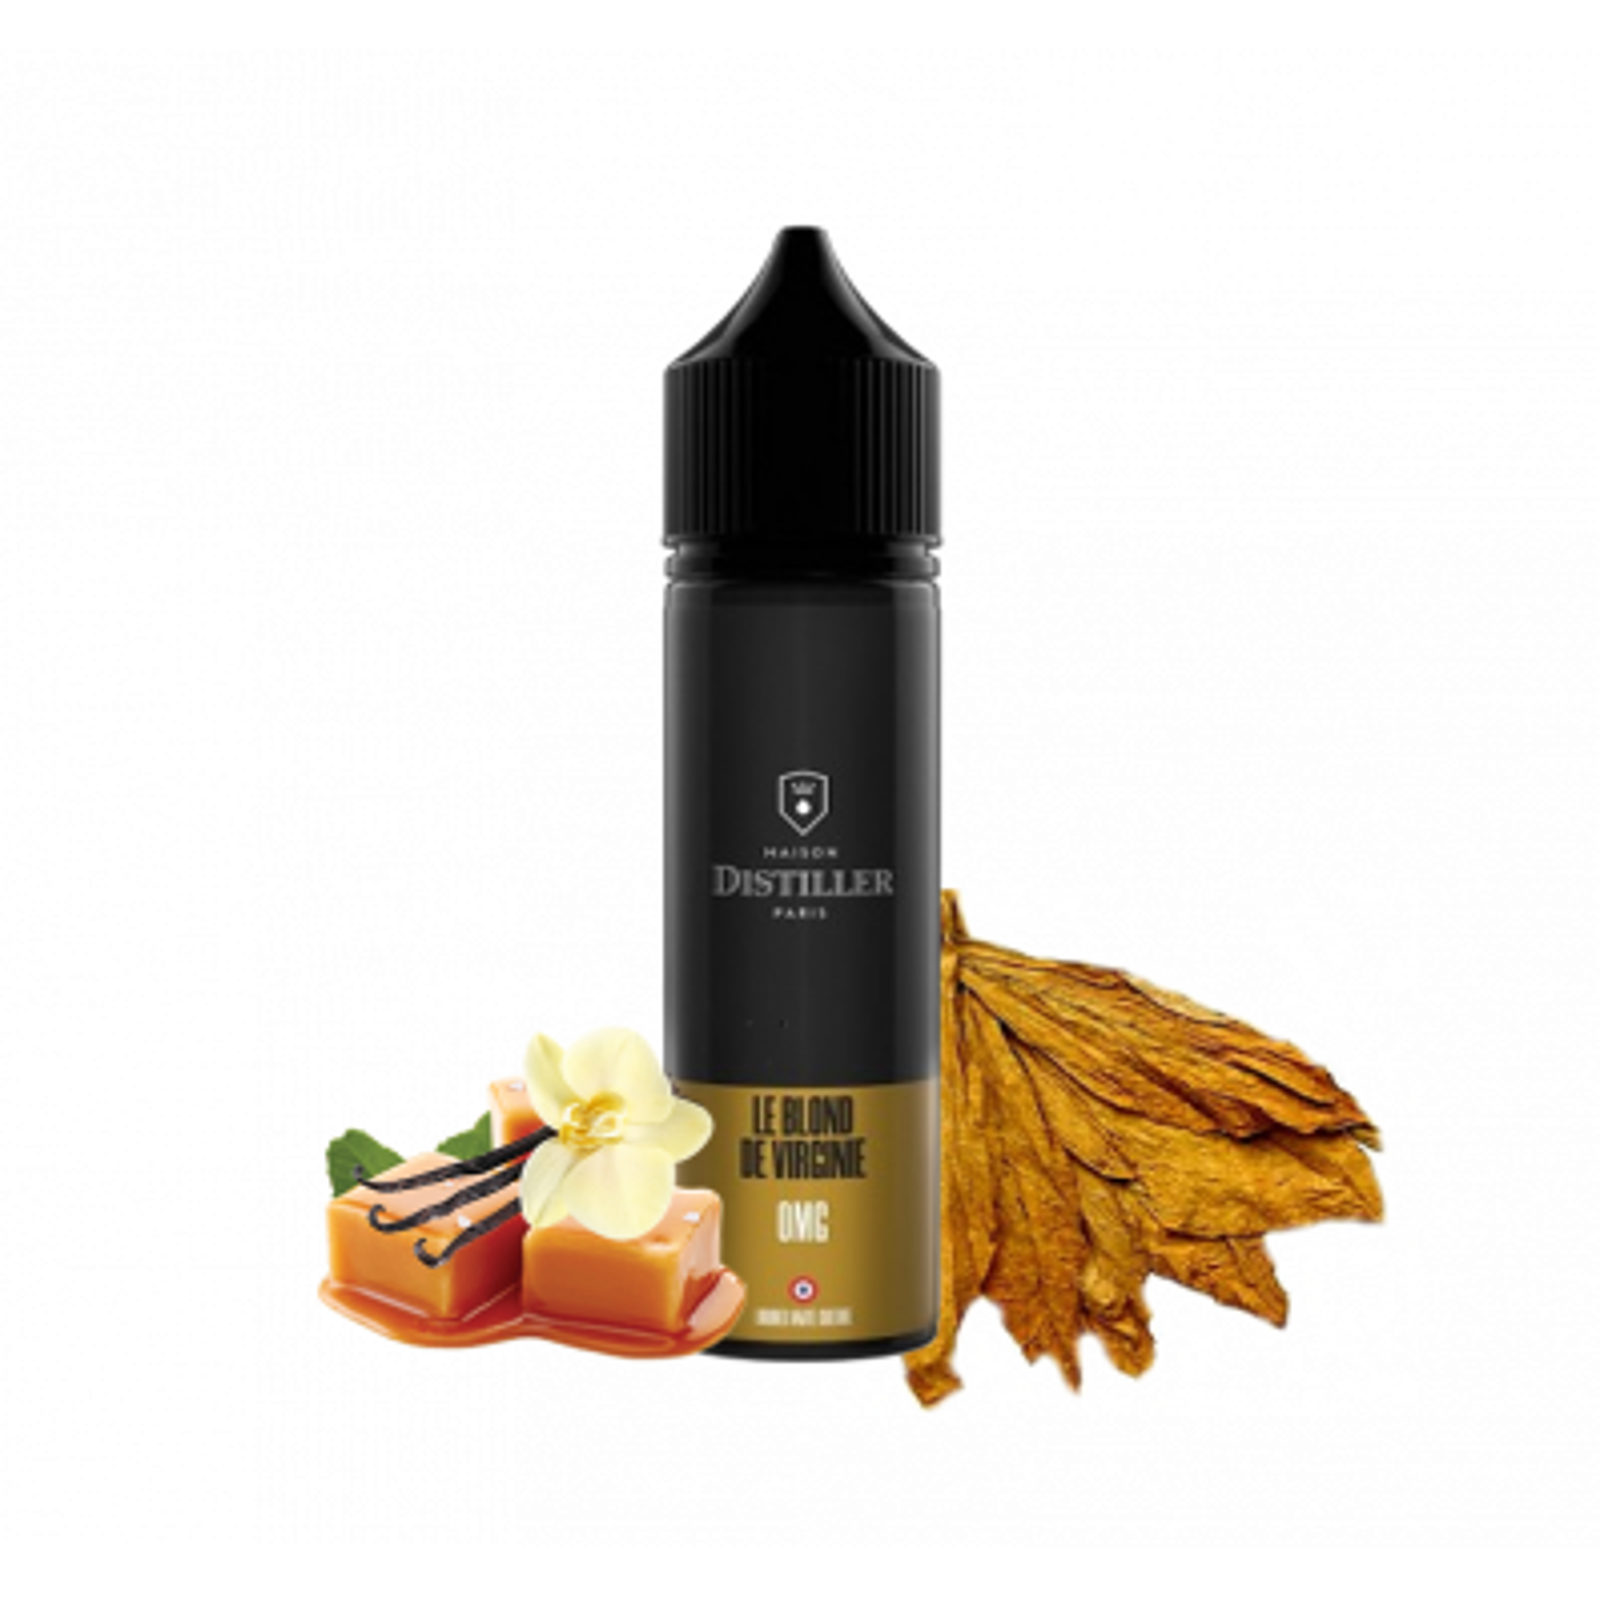 Le Blond De Virginie 50ml - Le Distiller